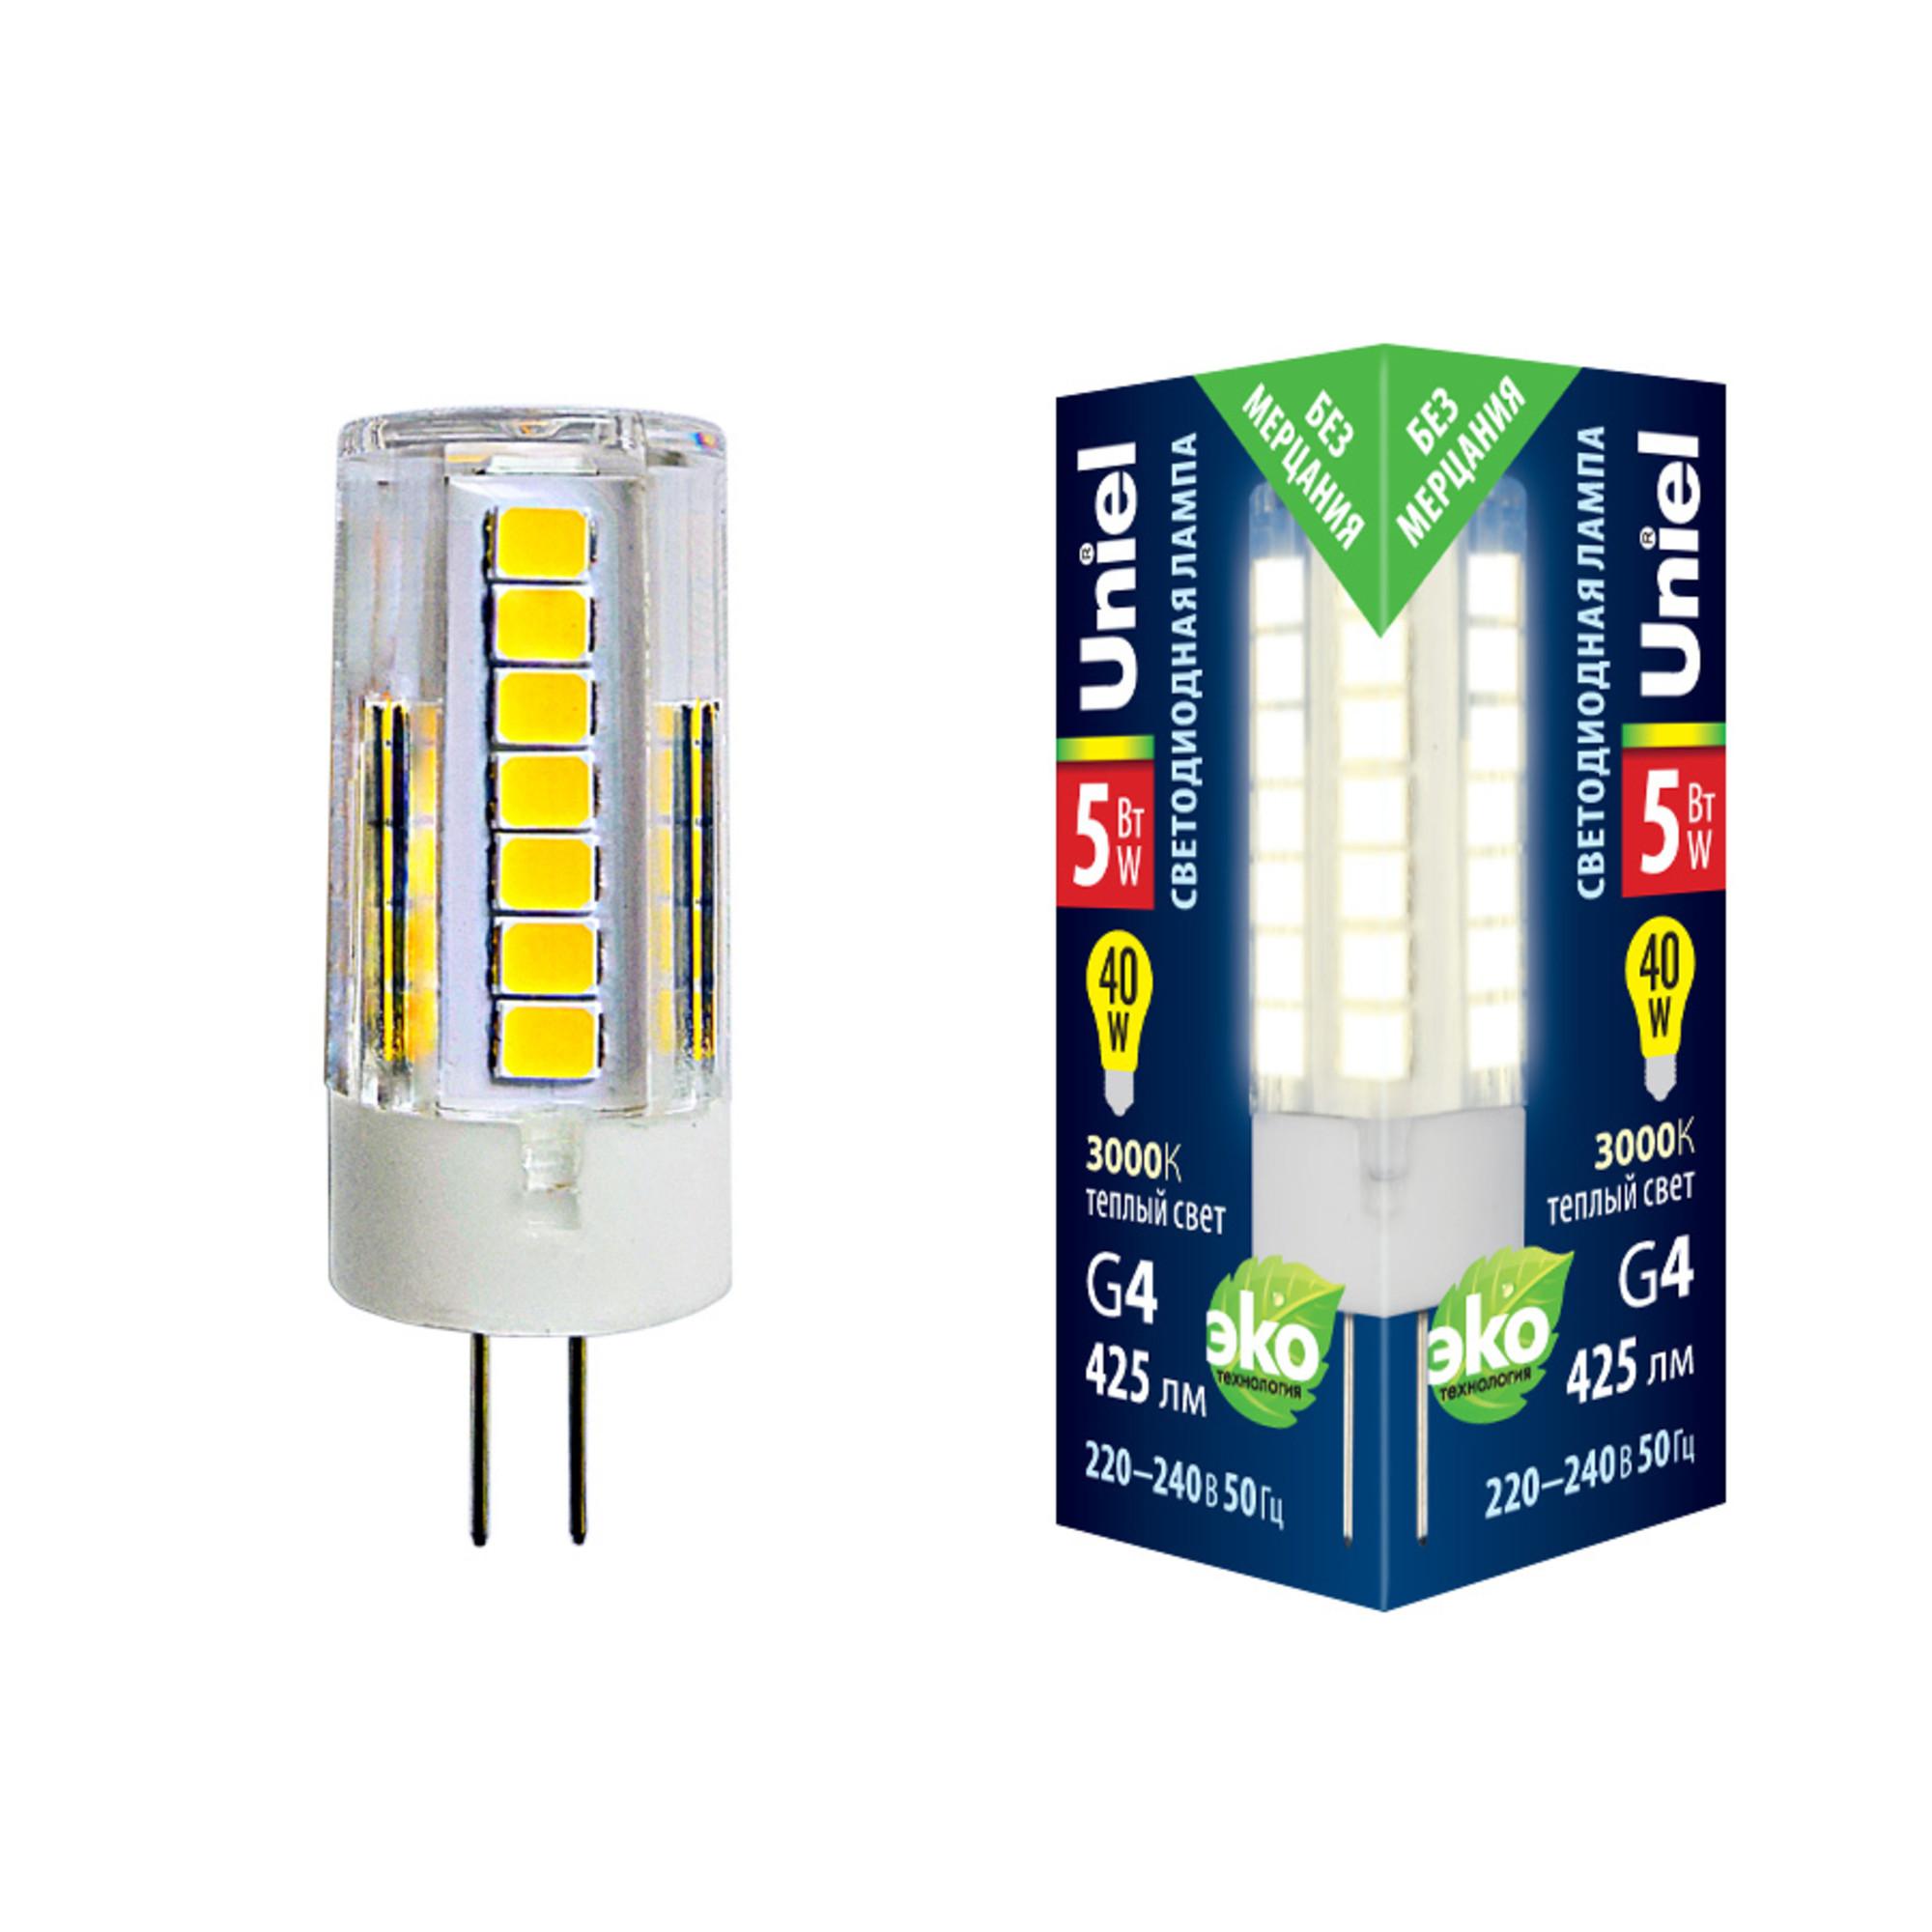 Лампа светодиодная G4 5 Вт капсула прозрачная 425 лм тёплый белый свет